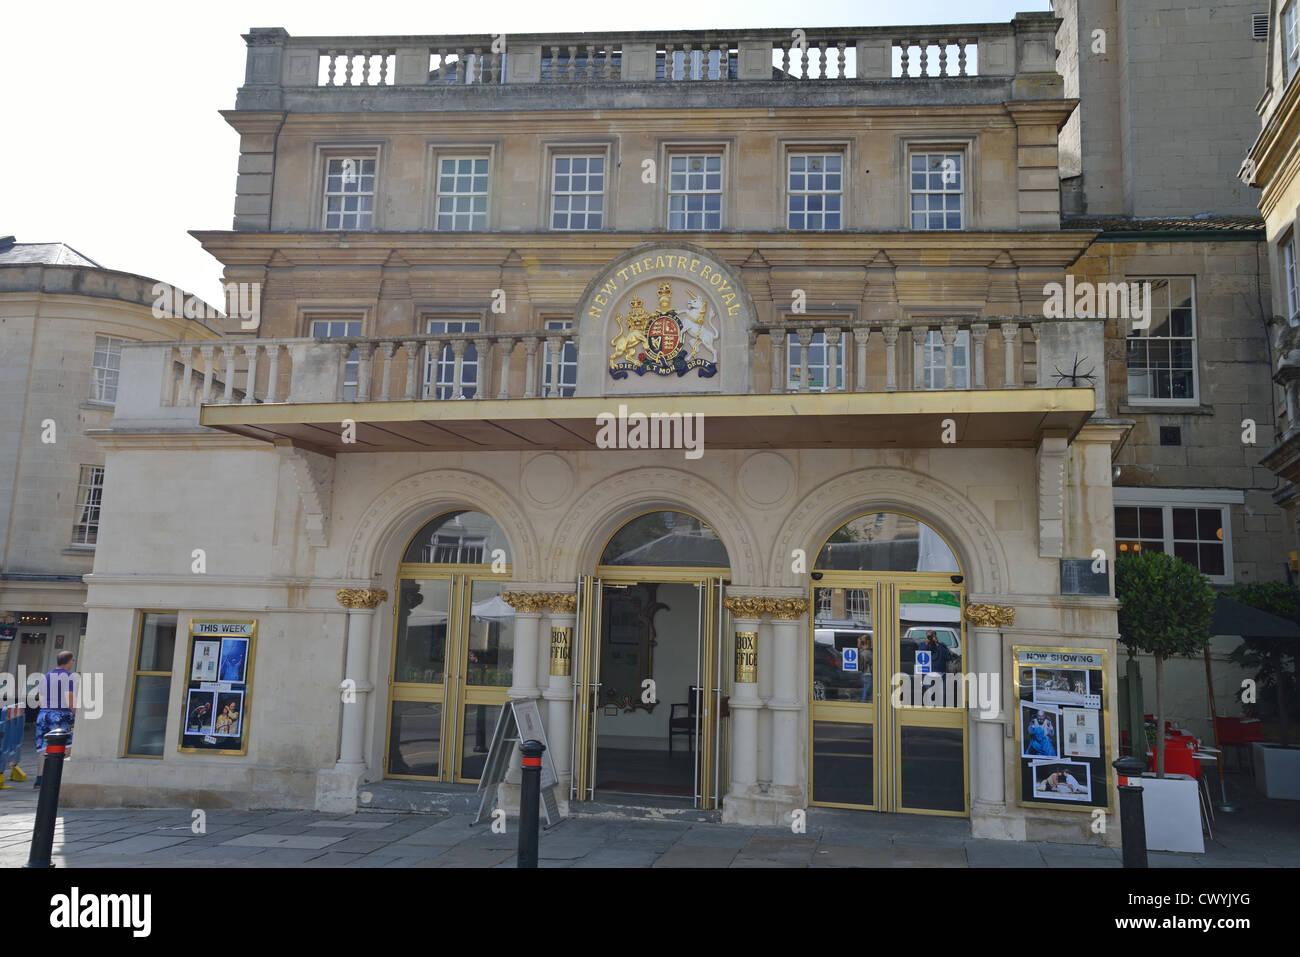 New Theatre Royal, Sawclose, Bath, Somerset, England, United Kingdom Stock Photo